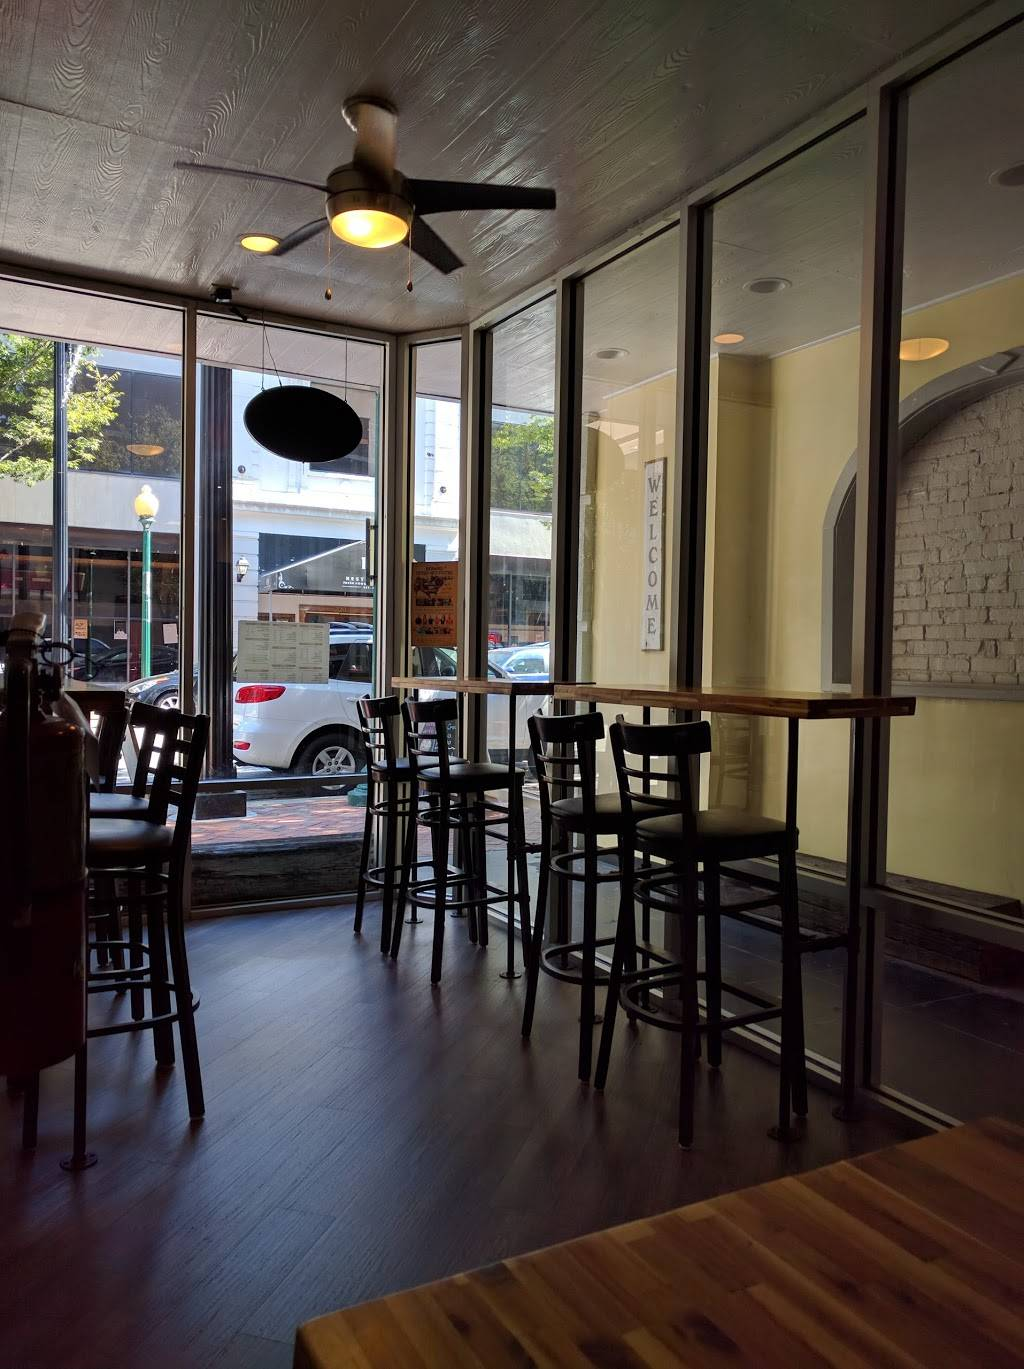 California Burrito   restaurant   319 Granby St, Norfolk, VA 23510, USA   7576220305 OR +1 757-622-0305